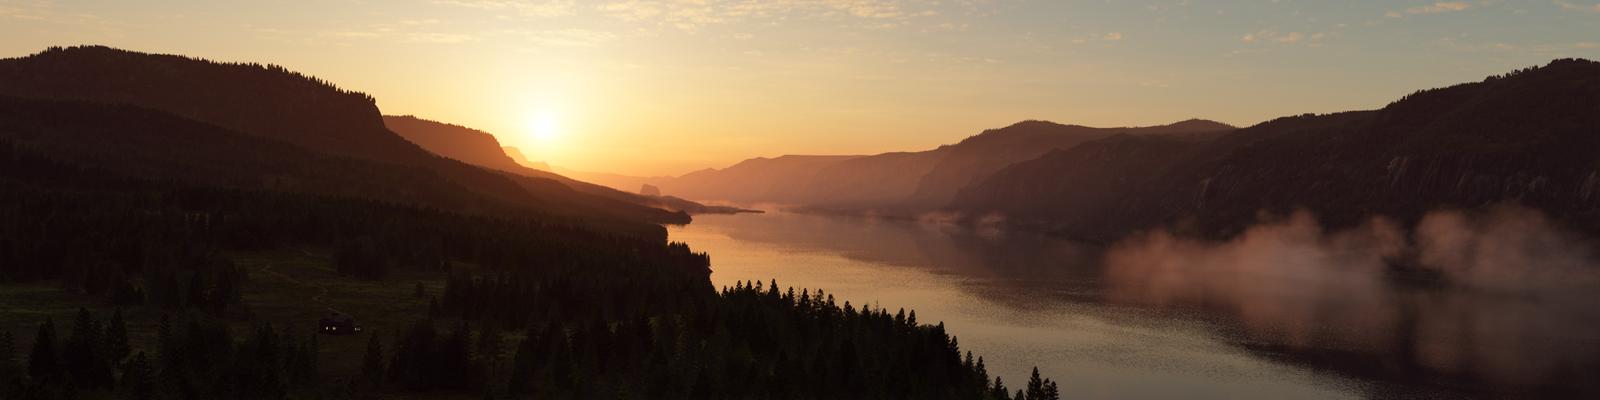 River Valley Sunrise by Gannaingh32